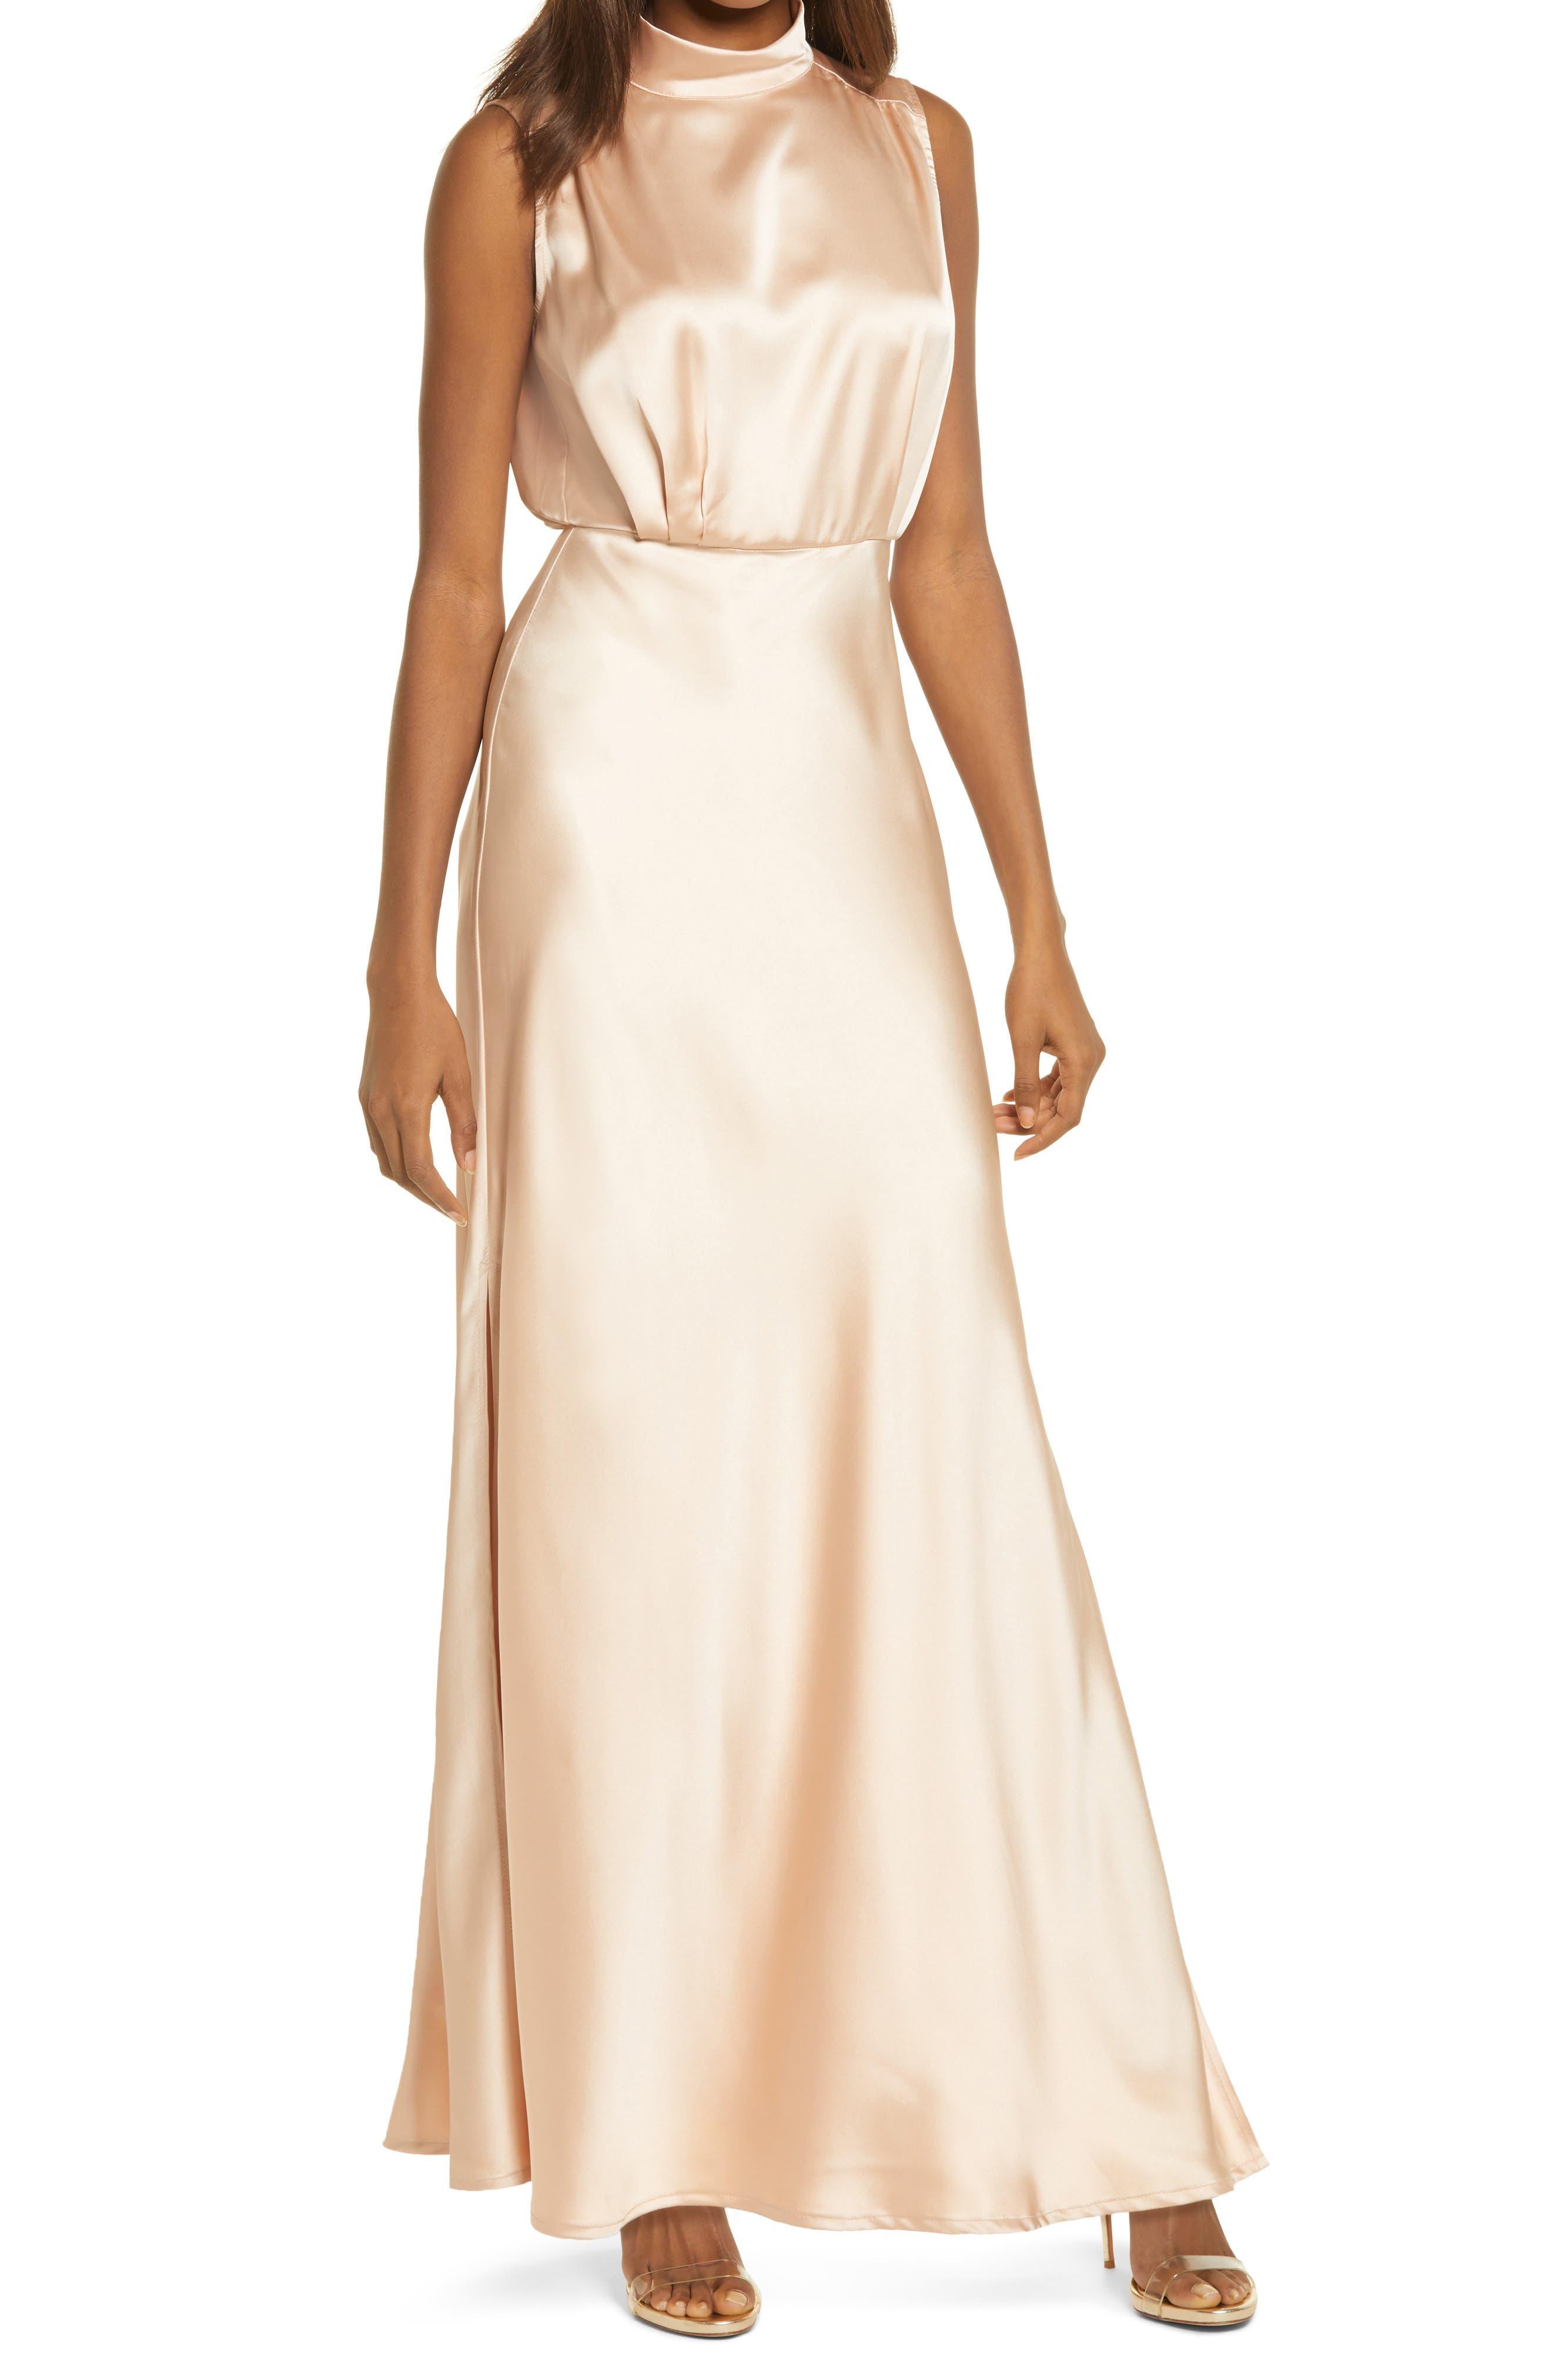 60s Wedding Dresses   70s Wedding Dresses Womens Lulus Classic Elegance Mock Neck Sleeveless Satin Gown Size Small - Beige $77.00 AT vintagedancer.com